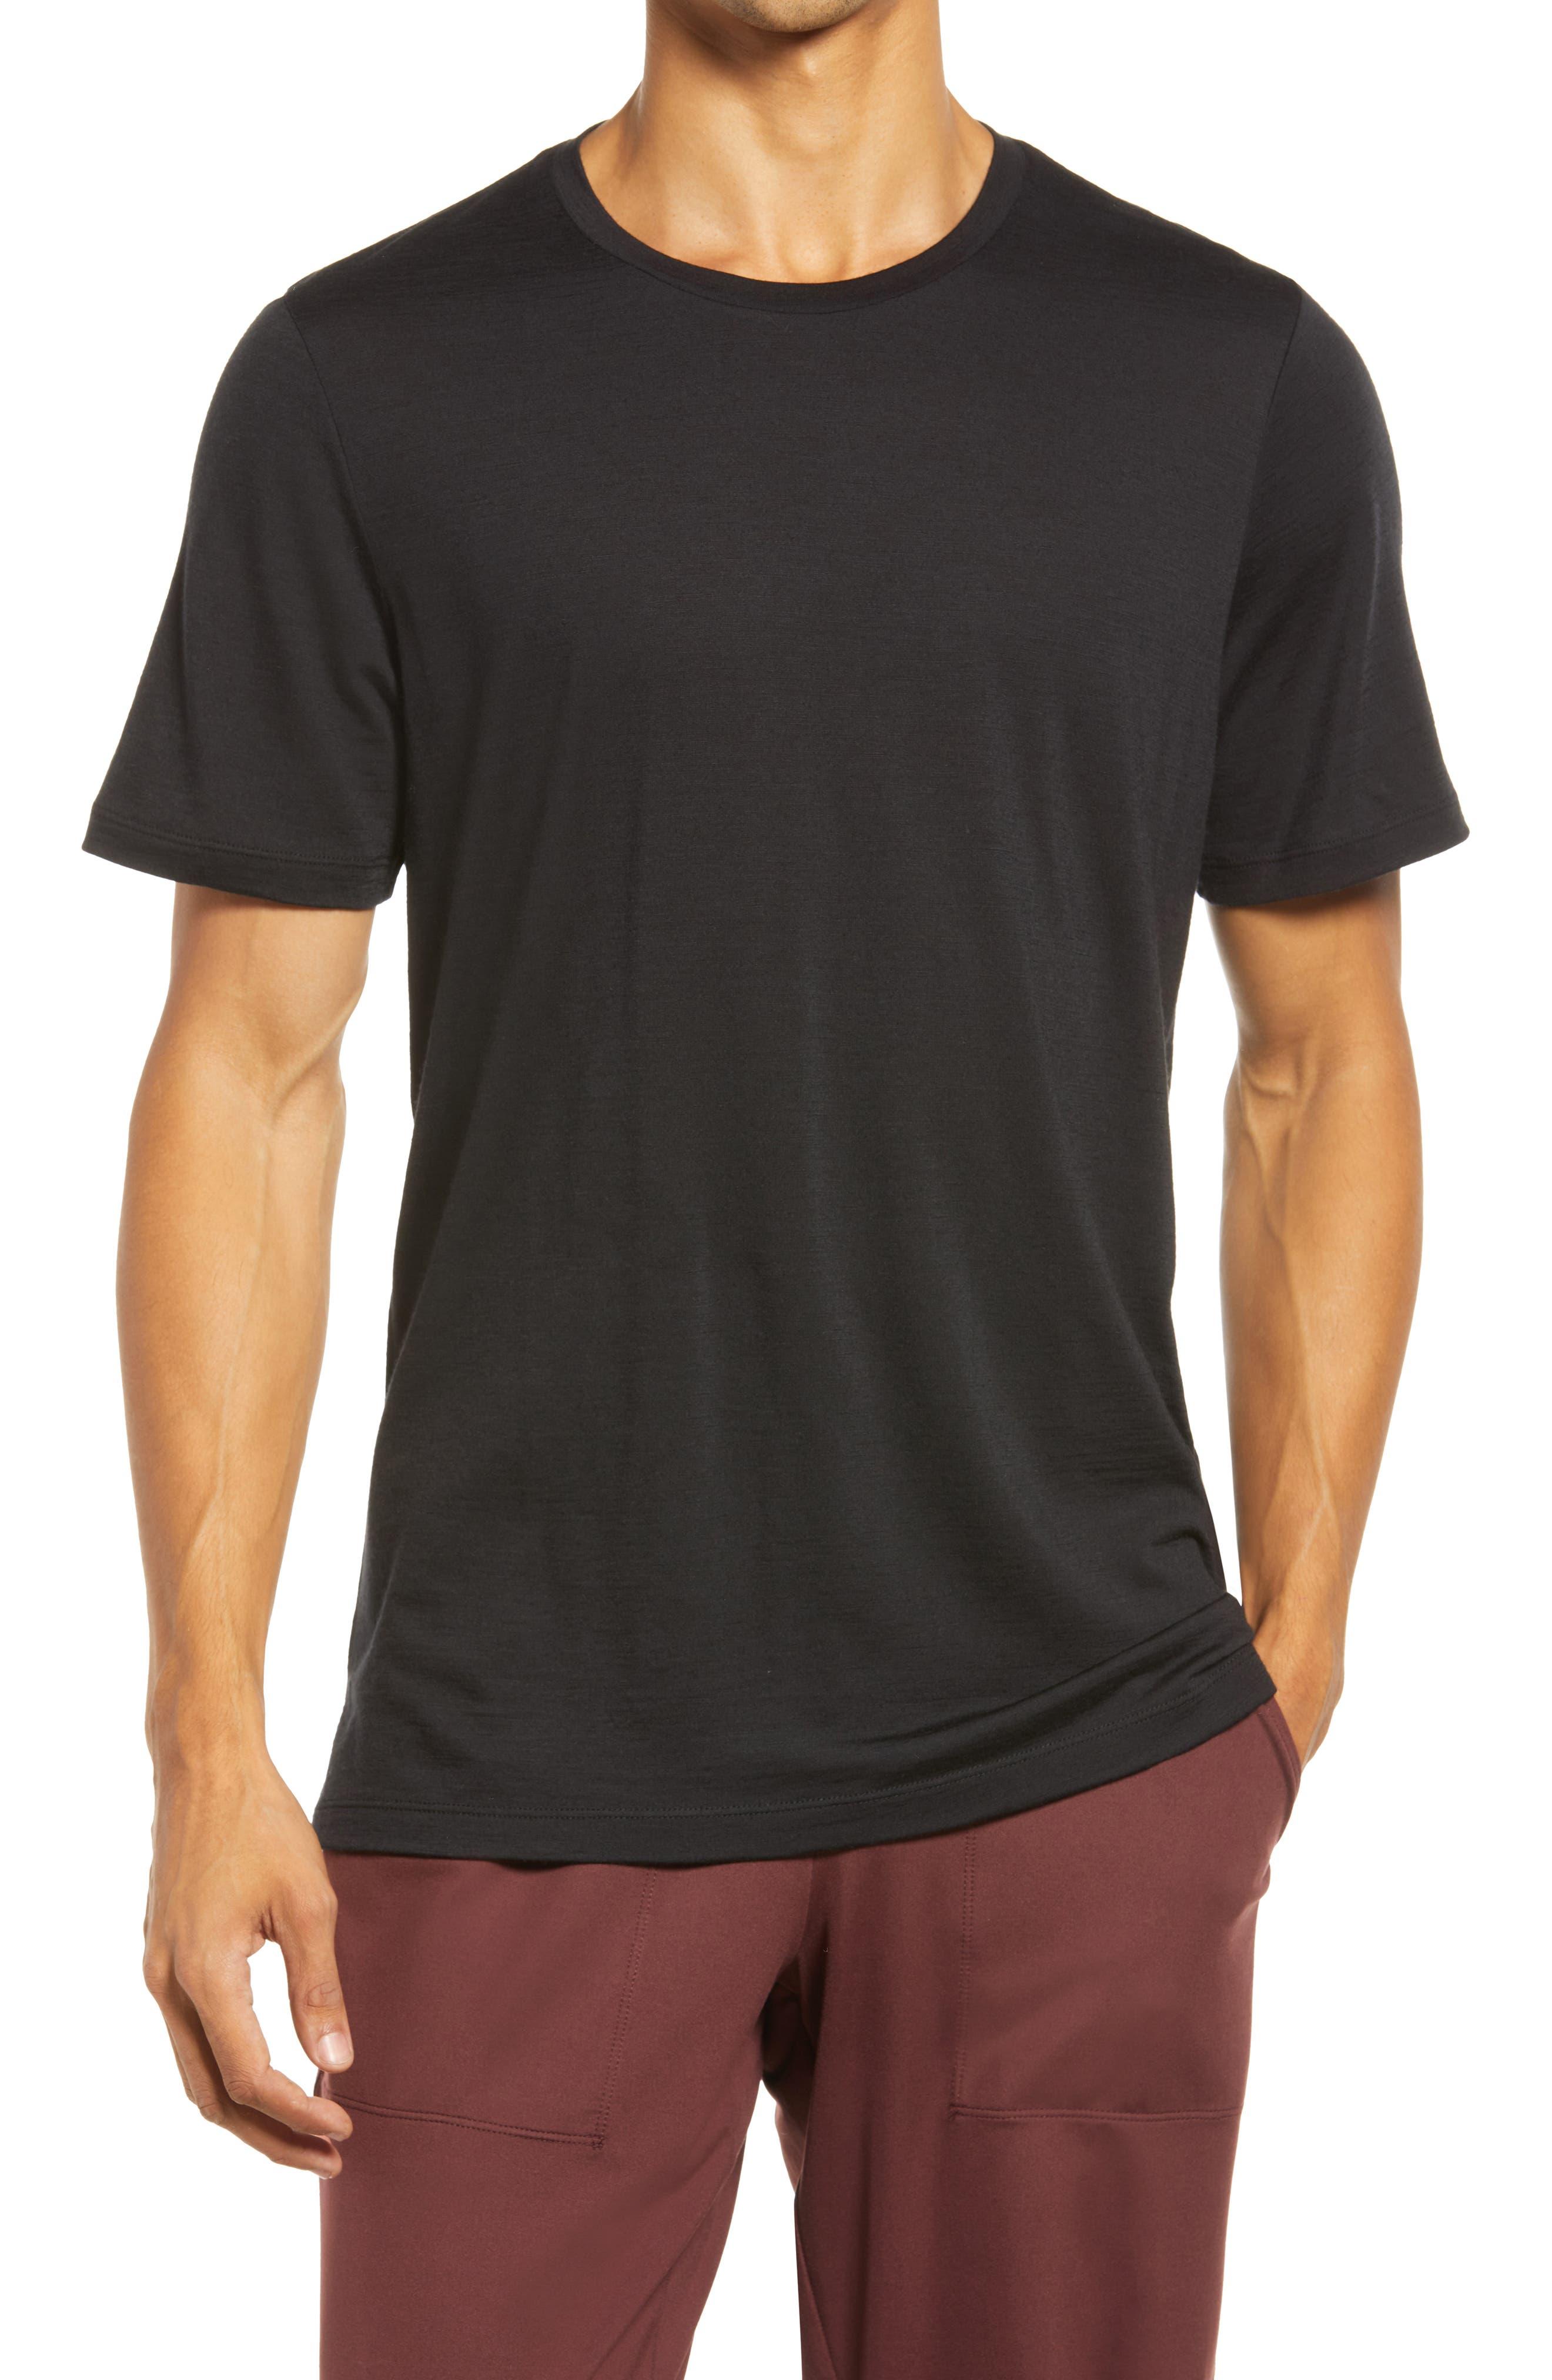 Cool-Lite(TM) Sphere Performance T-Shirt